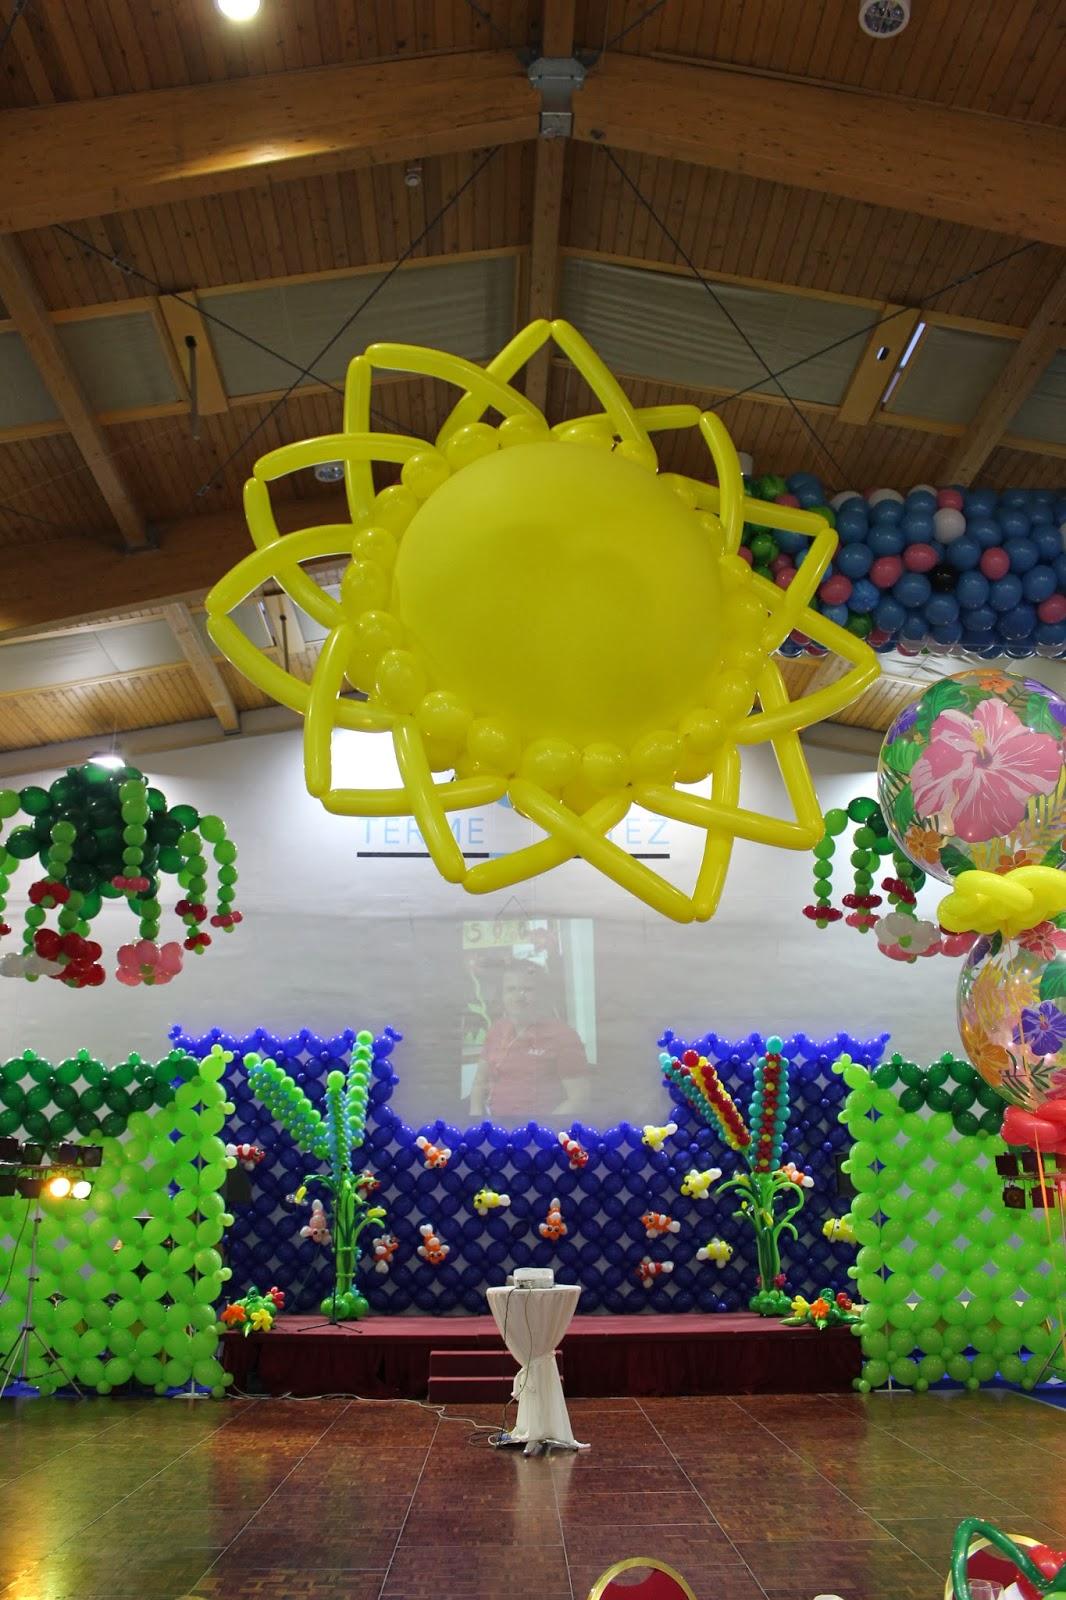 The Very Best Balloon Blog: Slovenia Event 2013 - Tropical Gala ...